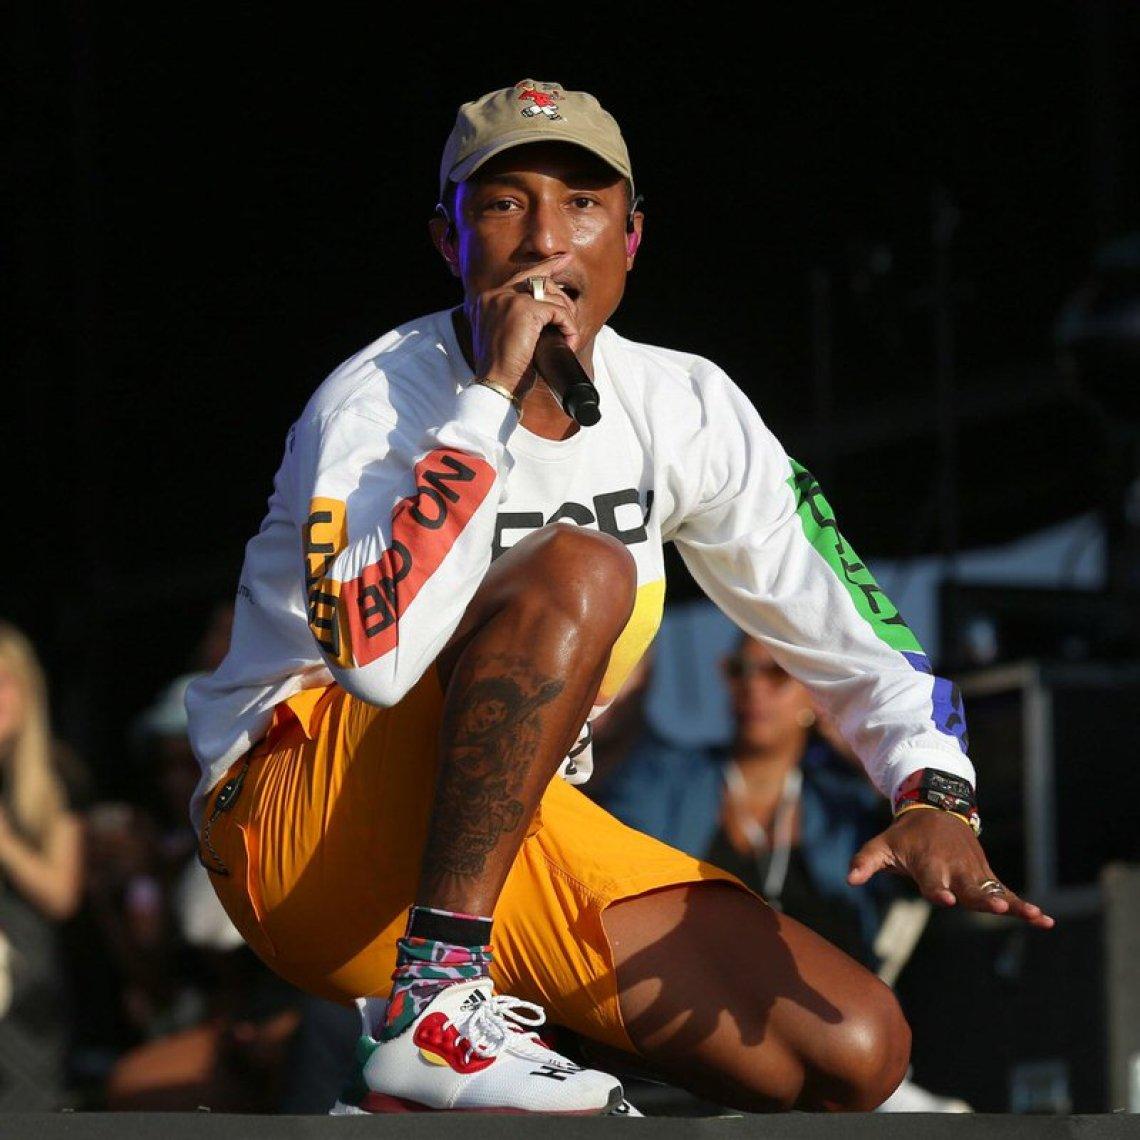 Pharrell Williams in the Pharrell Williams x adidas Solar Glide ST